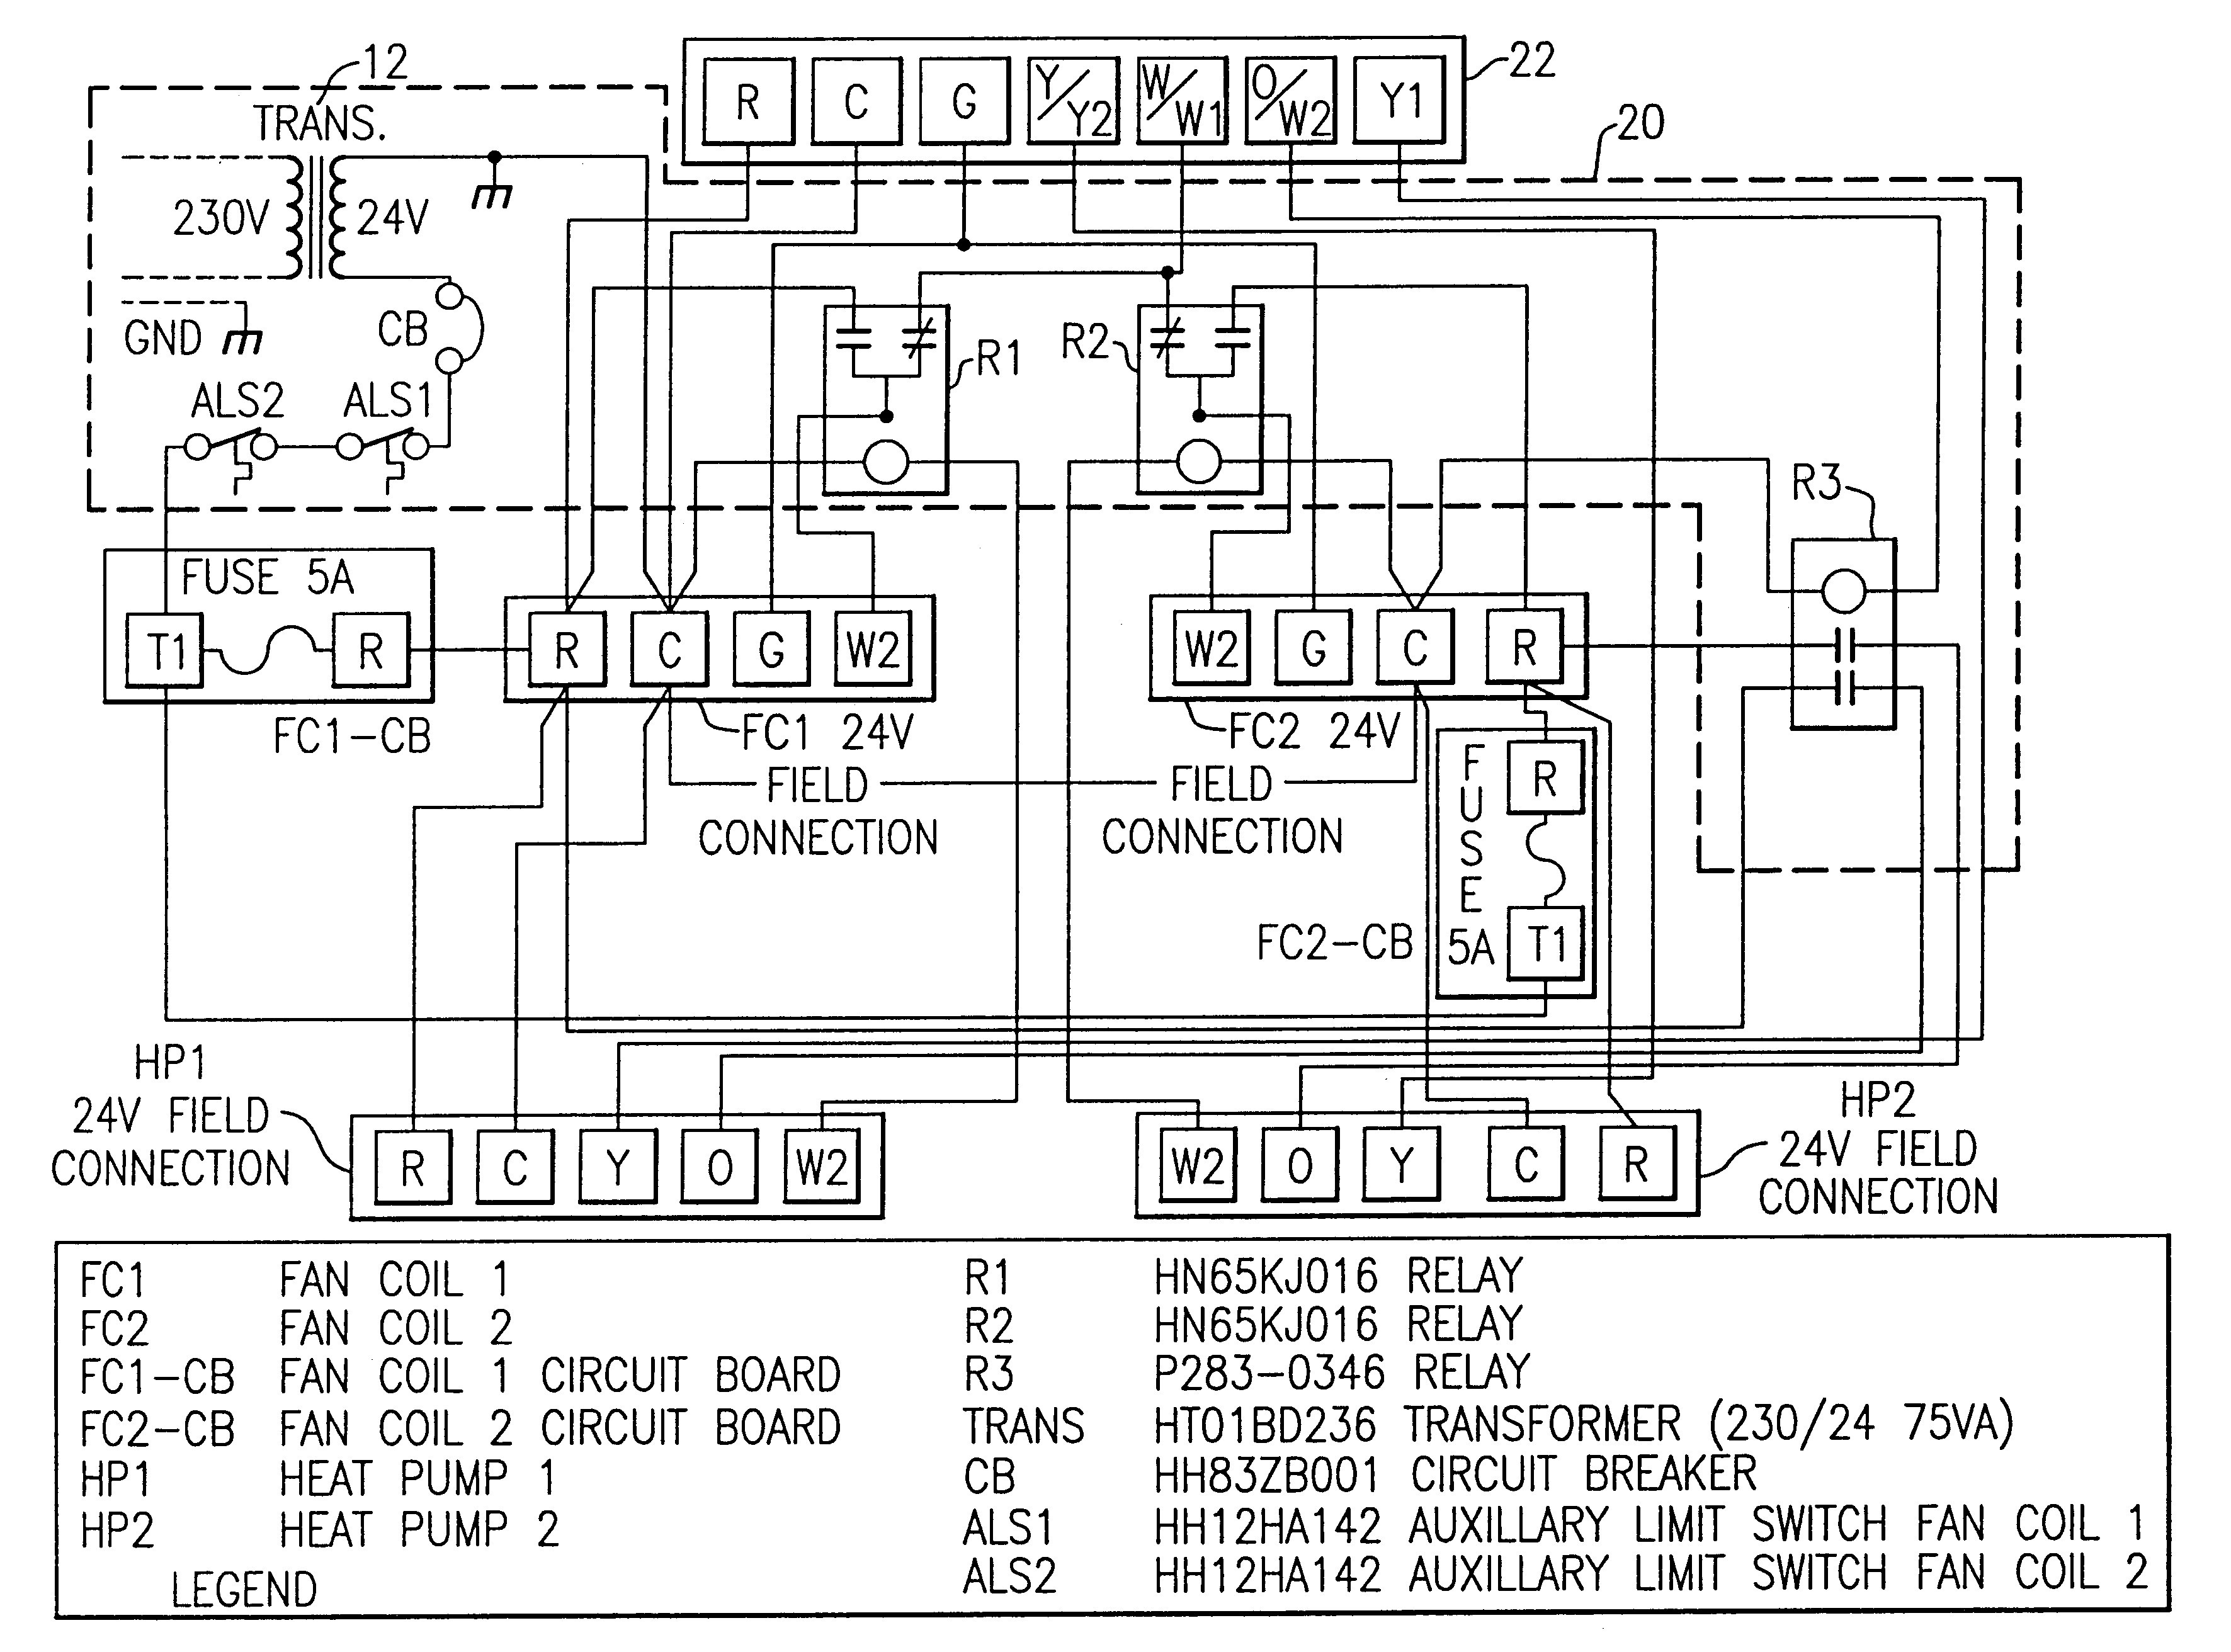 Heat Pump Wiring Diagrams Inspirational Electric Heat Strip Wiring Diagram Diagram Of Heat Pump Wiring Diagrams